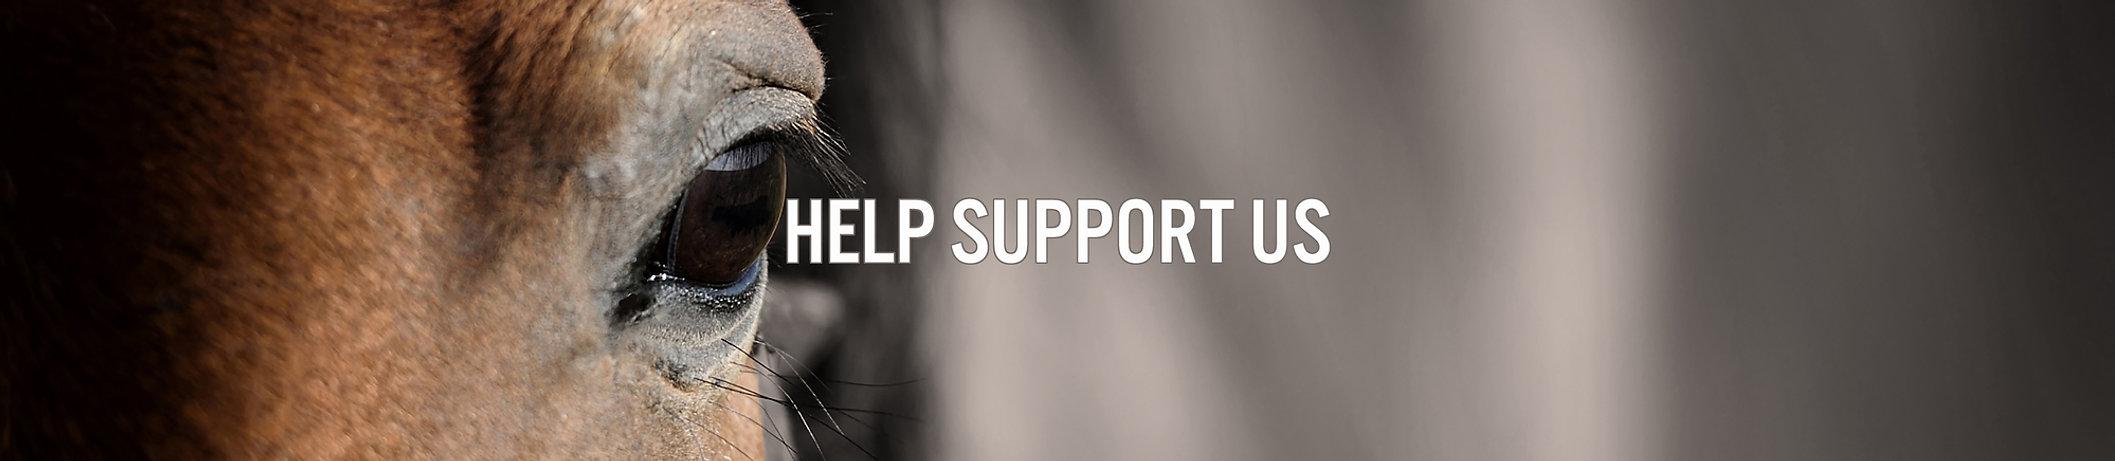 HELP SUPPORT US.jpg